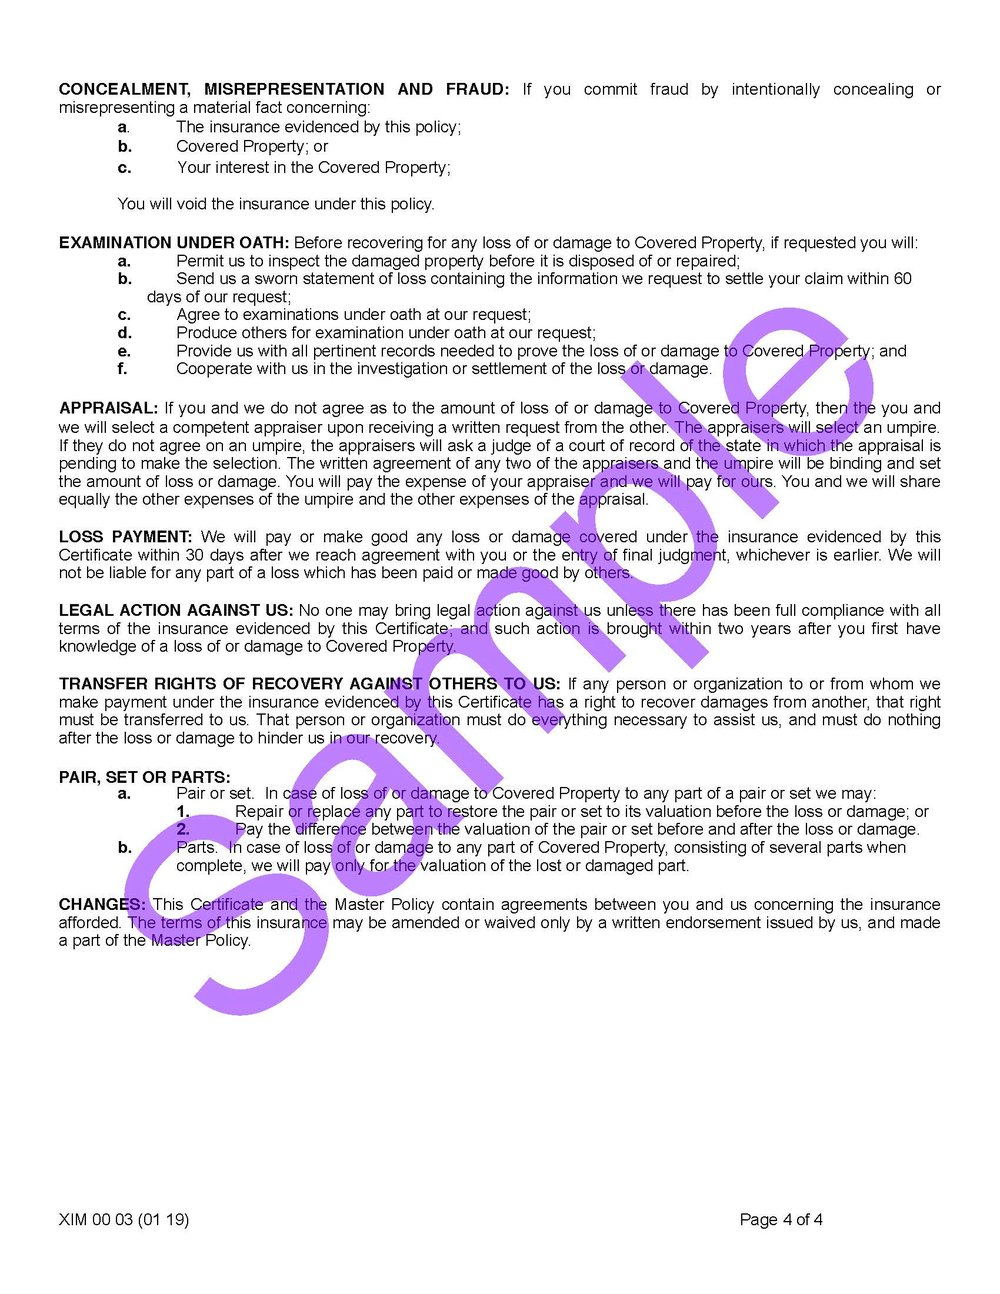 CW XIM 00 03 (01-19) Certificate of InsuranceSample_Page_4.jpg